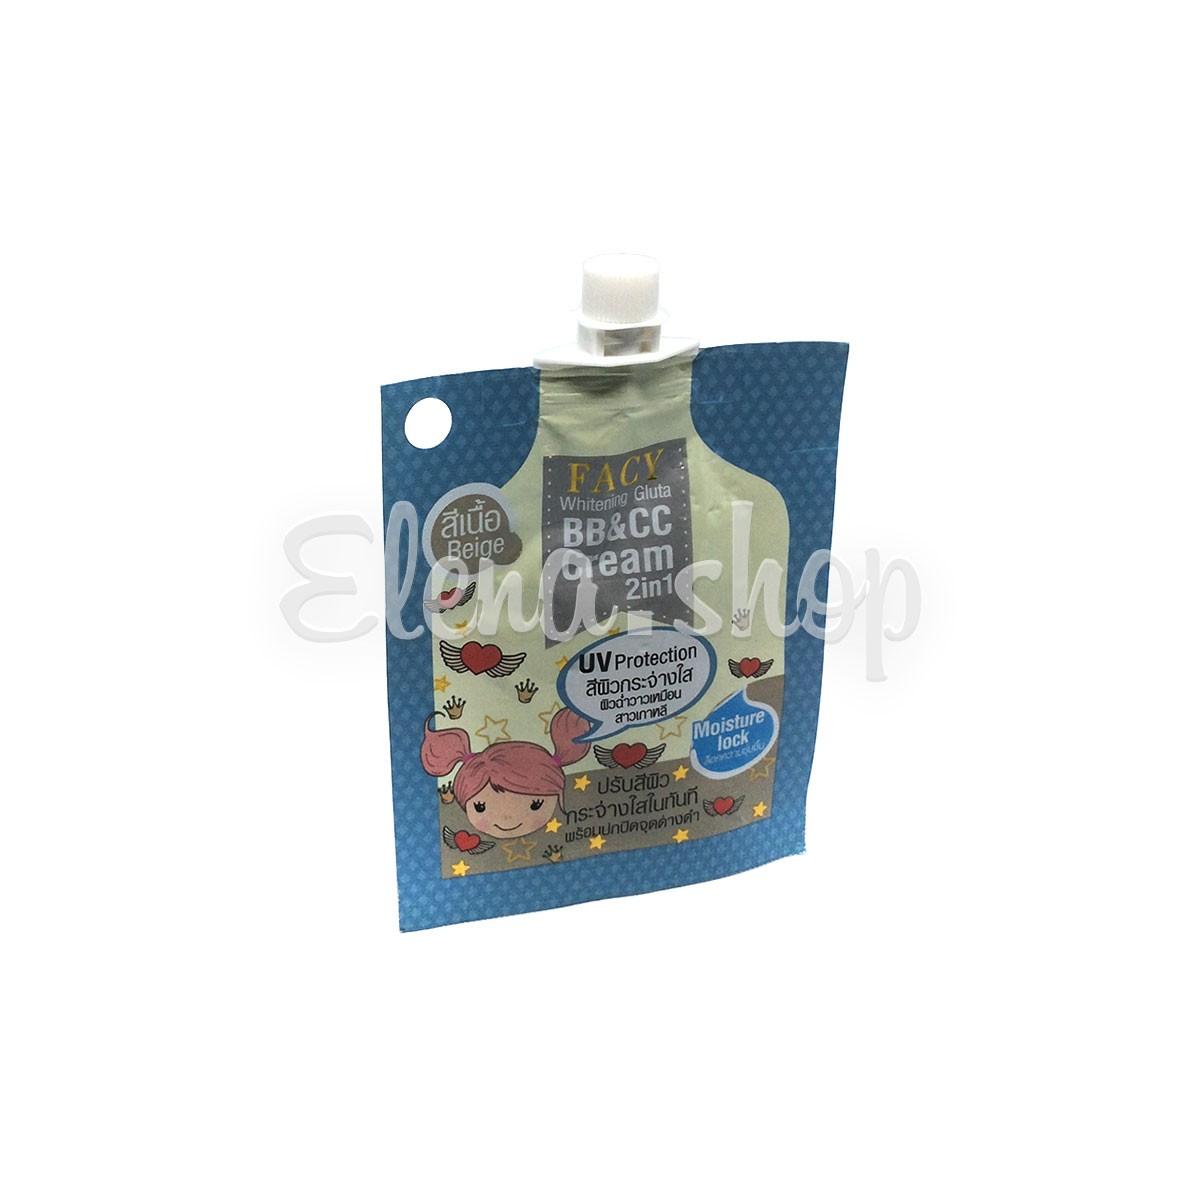 Крем для лица Facy Whitening Gluta BB & CC cream (бежевый)